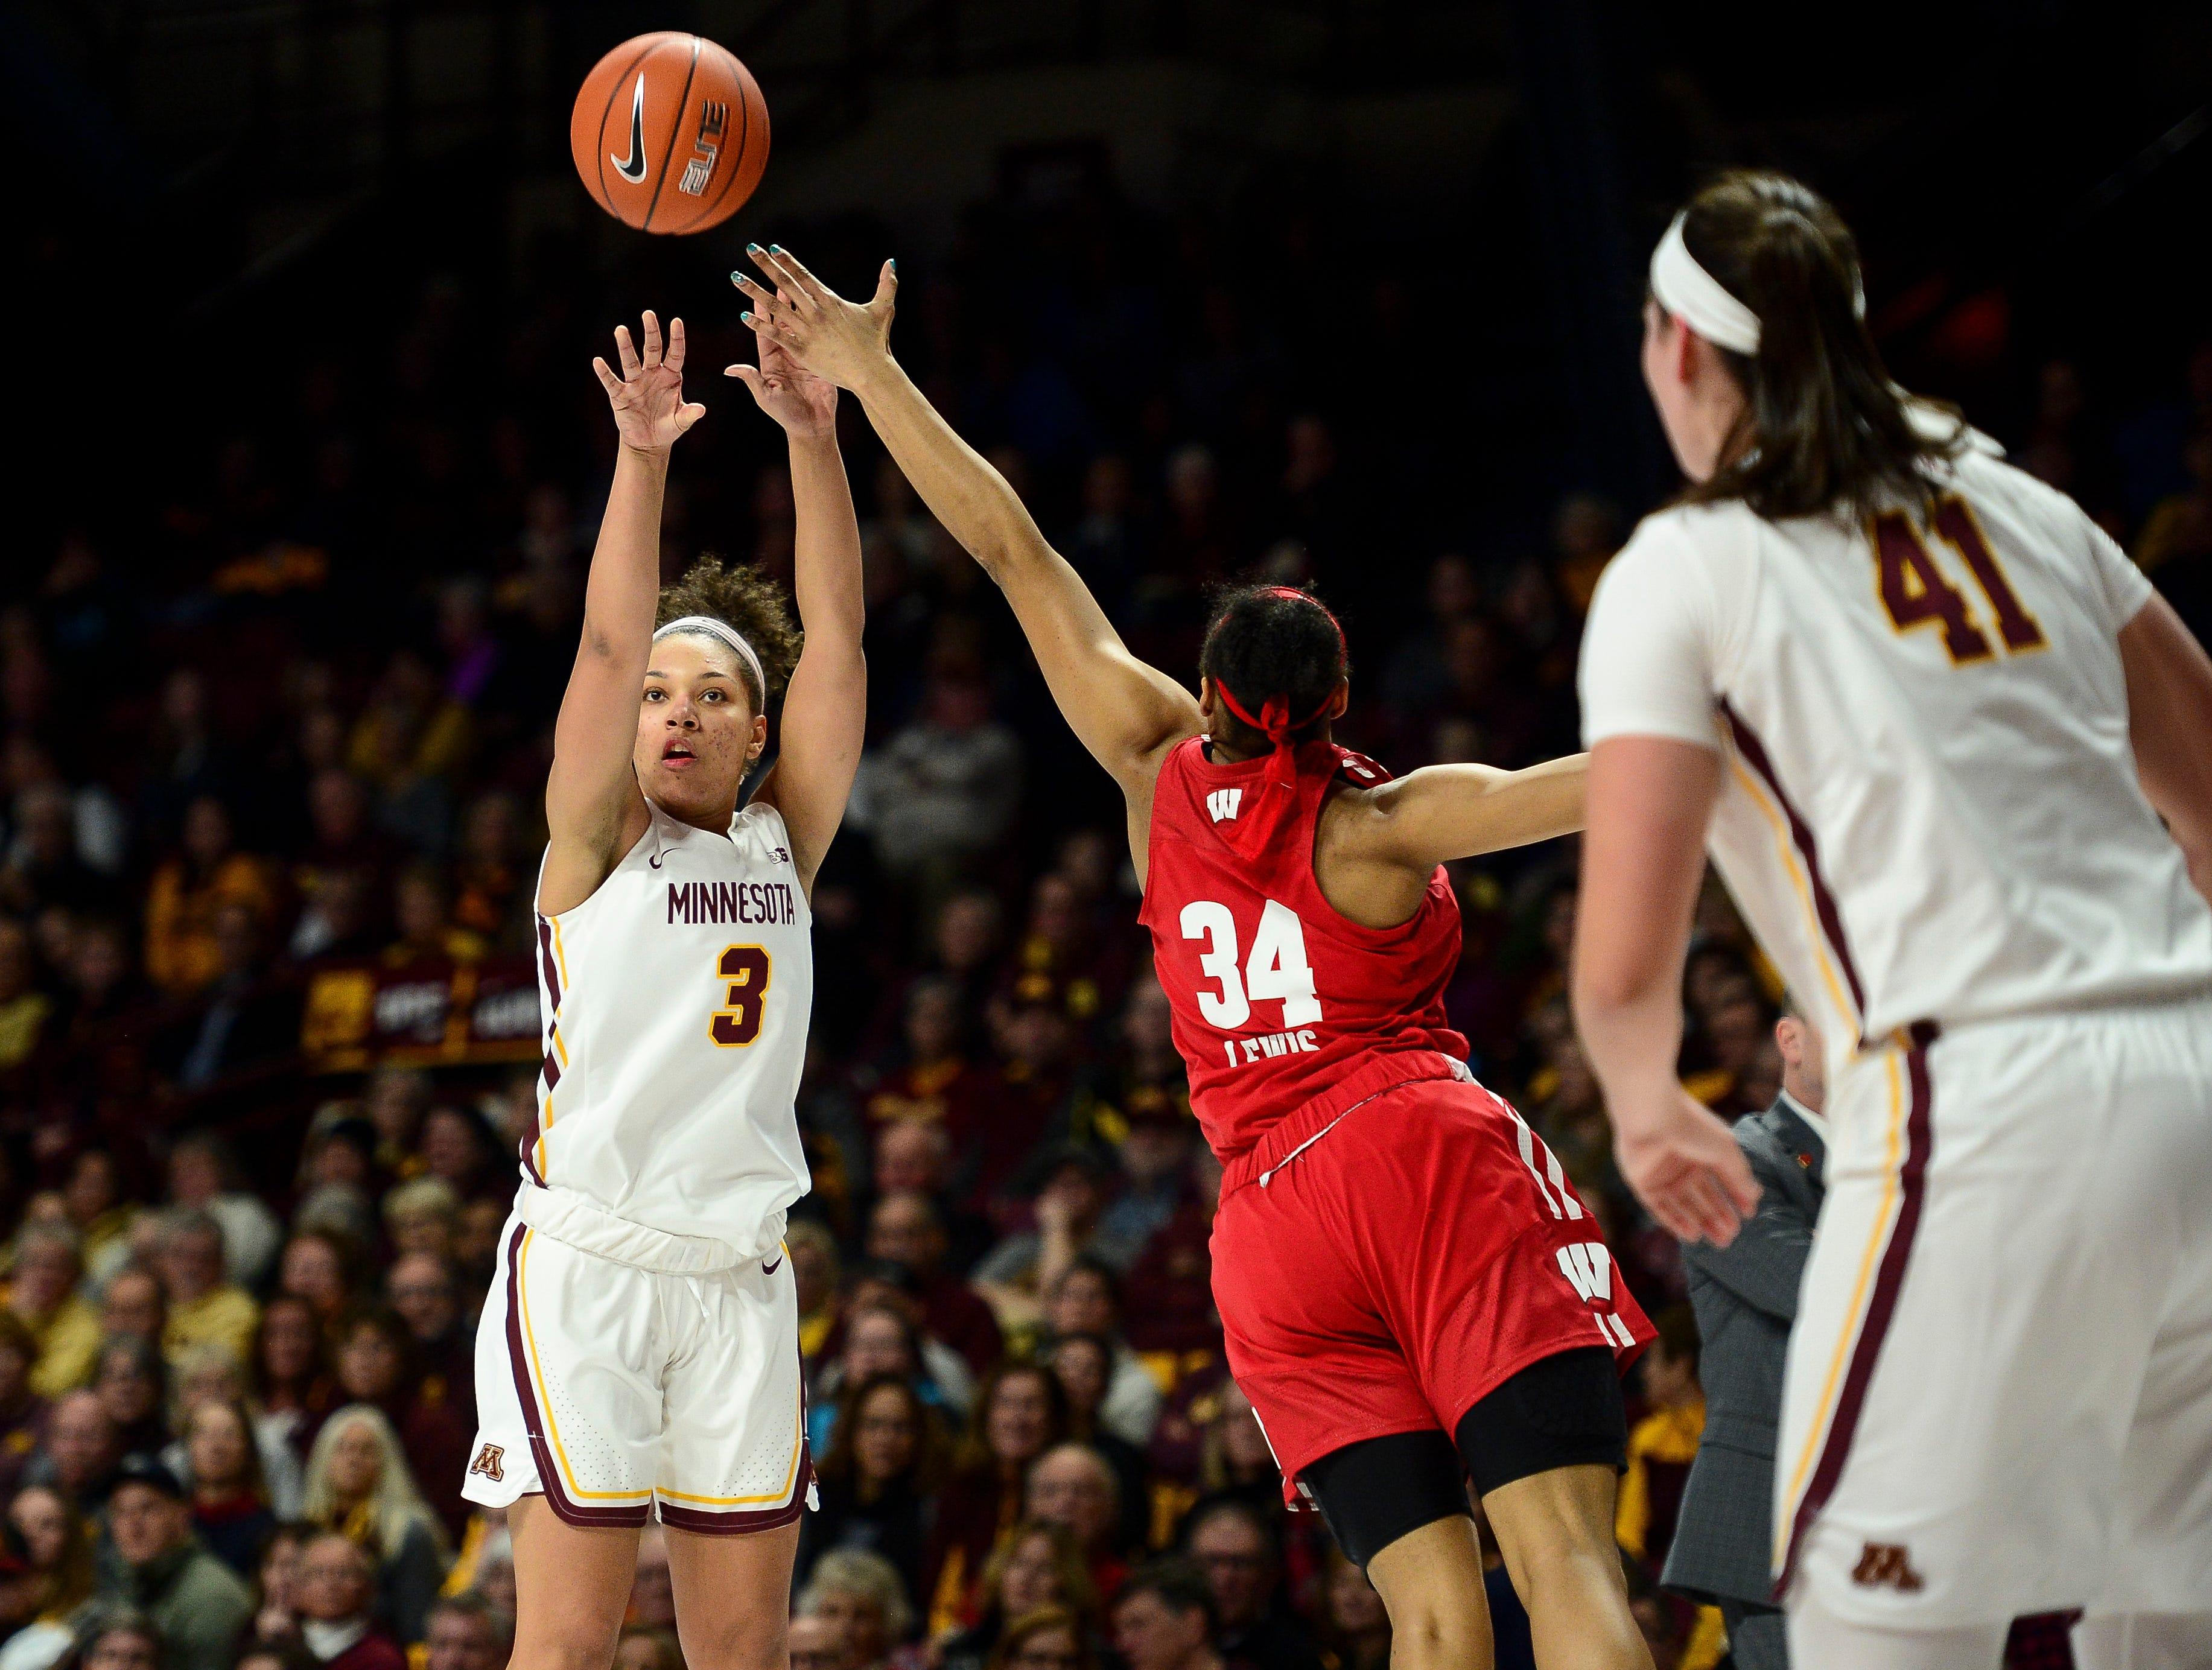 Lamke's 20 helps No. 12 Minnesota top Wisconsin 74-56